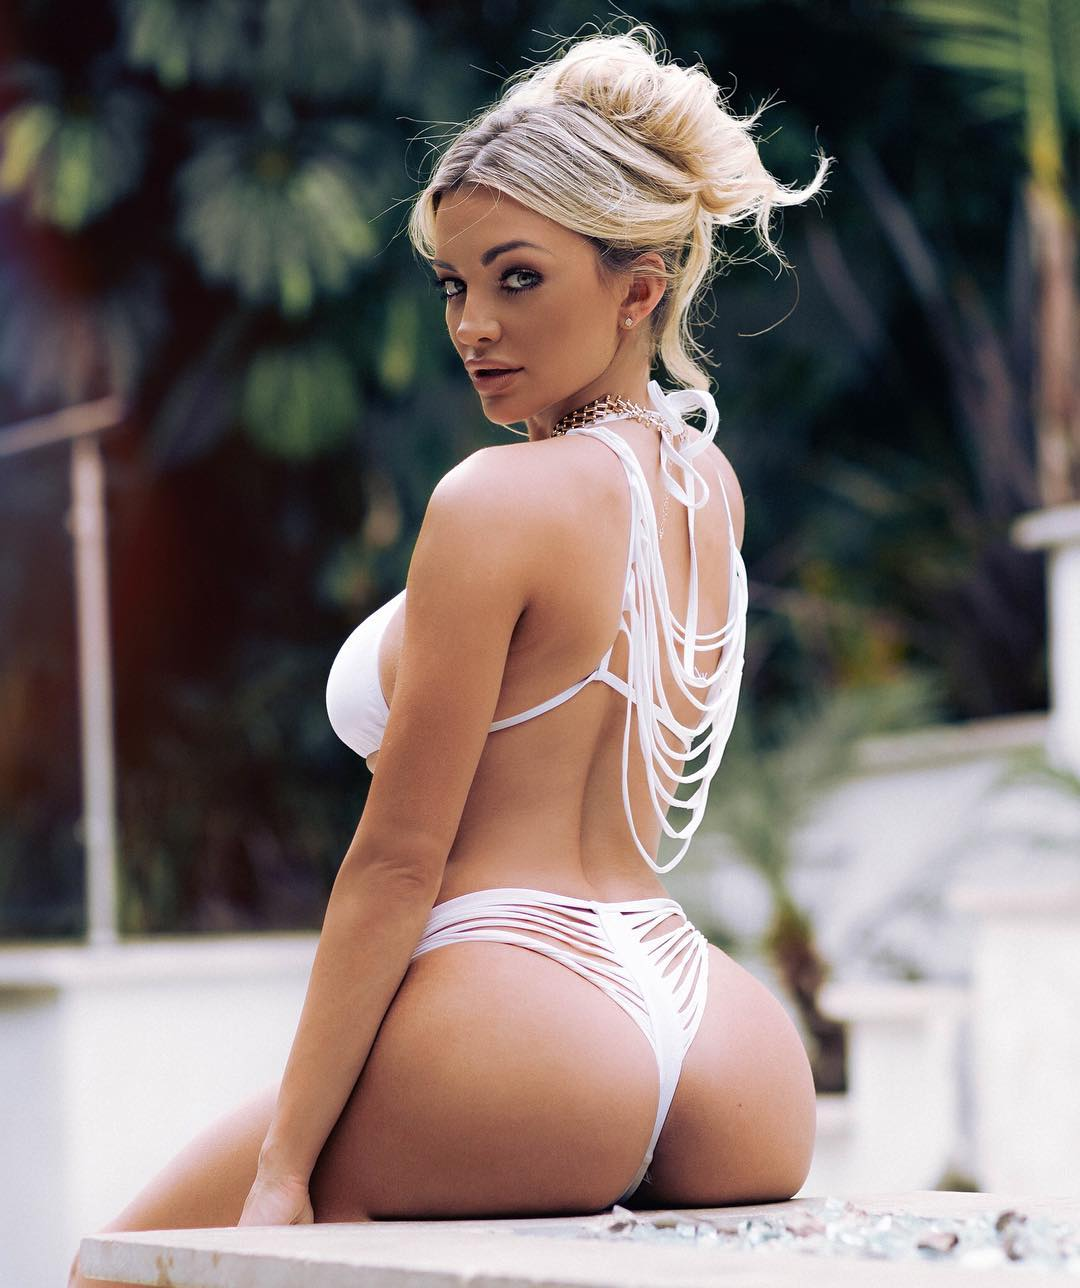 lindsey-pelas-bikini-pics-are-so-hot-4